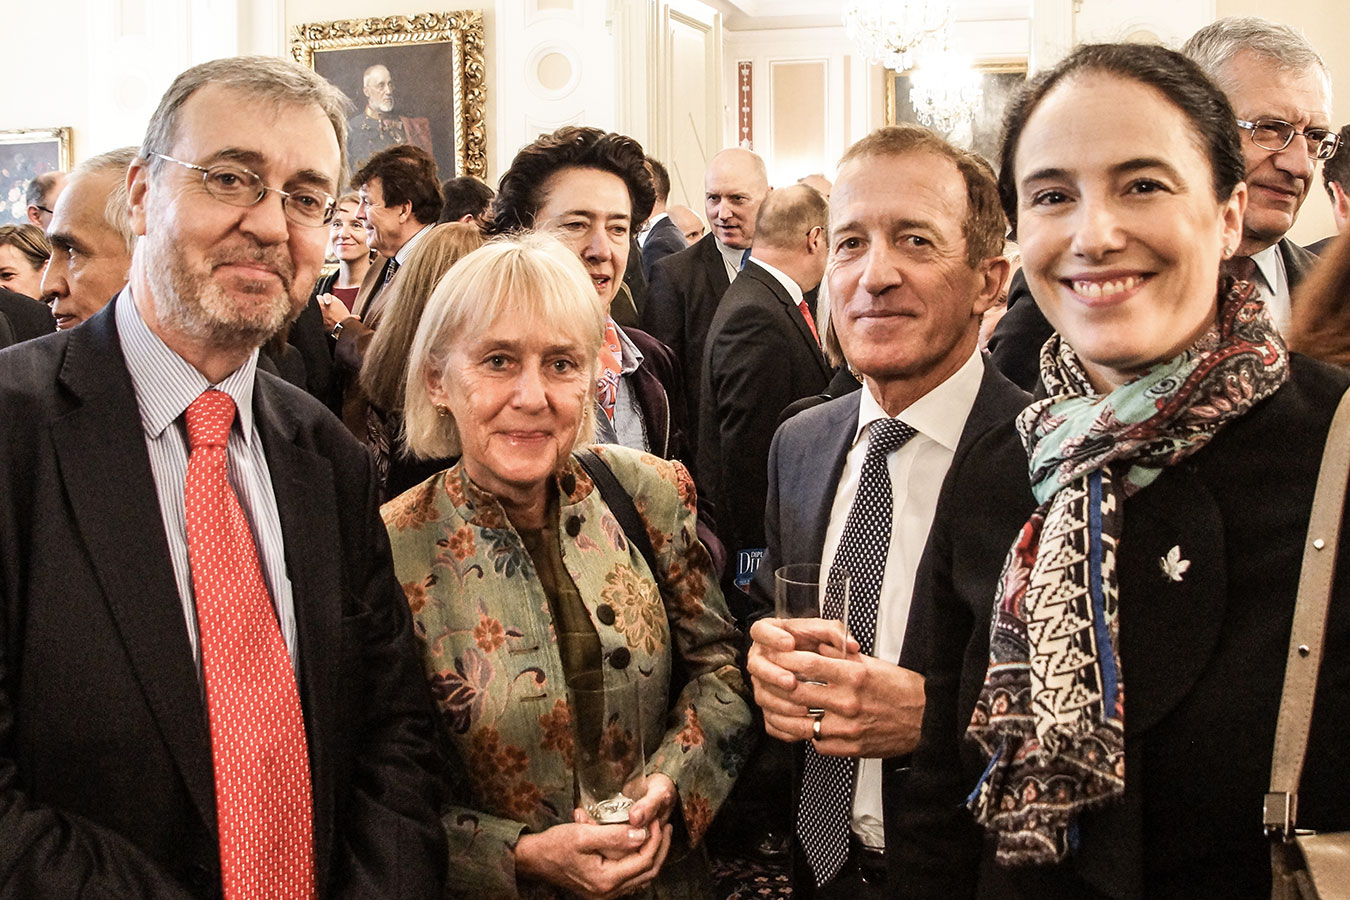 a-national-day-2018-ambassador-kelly-bogdanska-burkhard-poupart.jpg